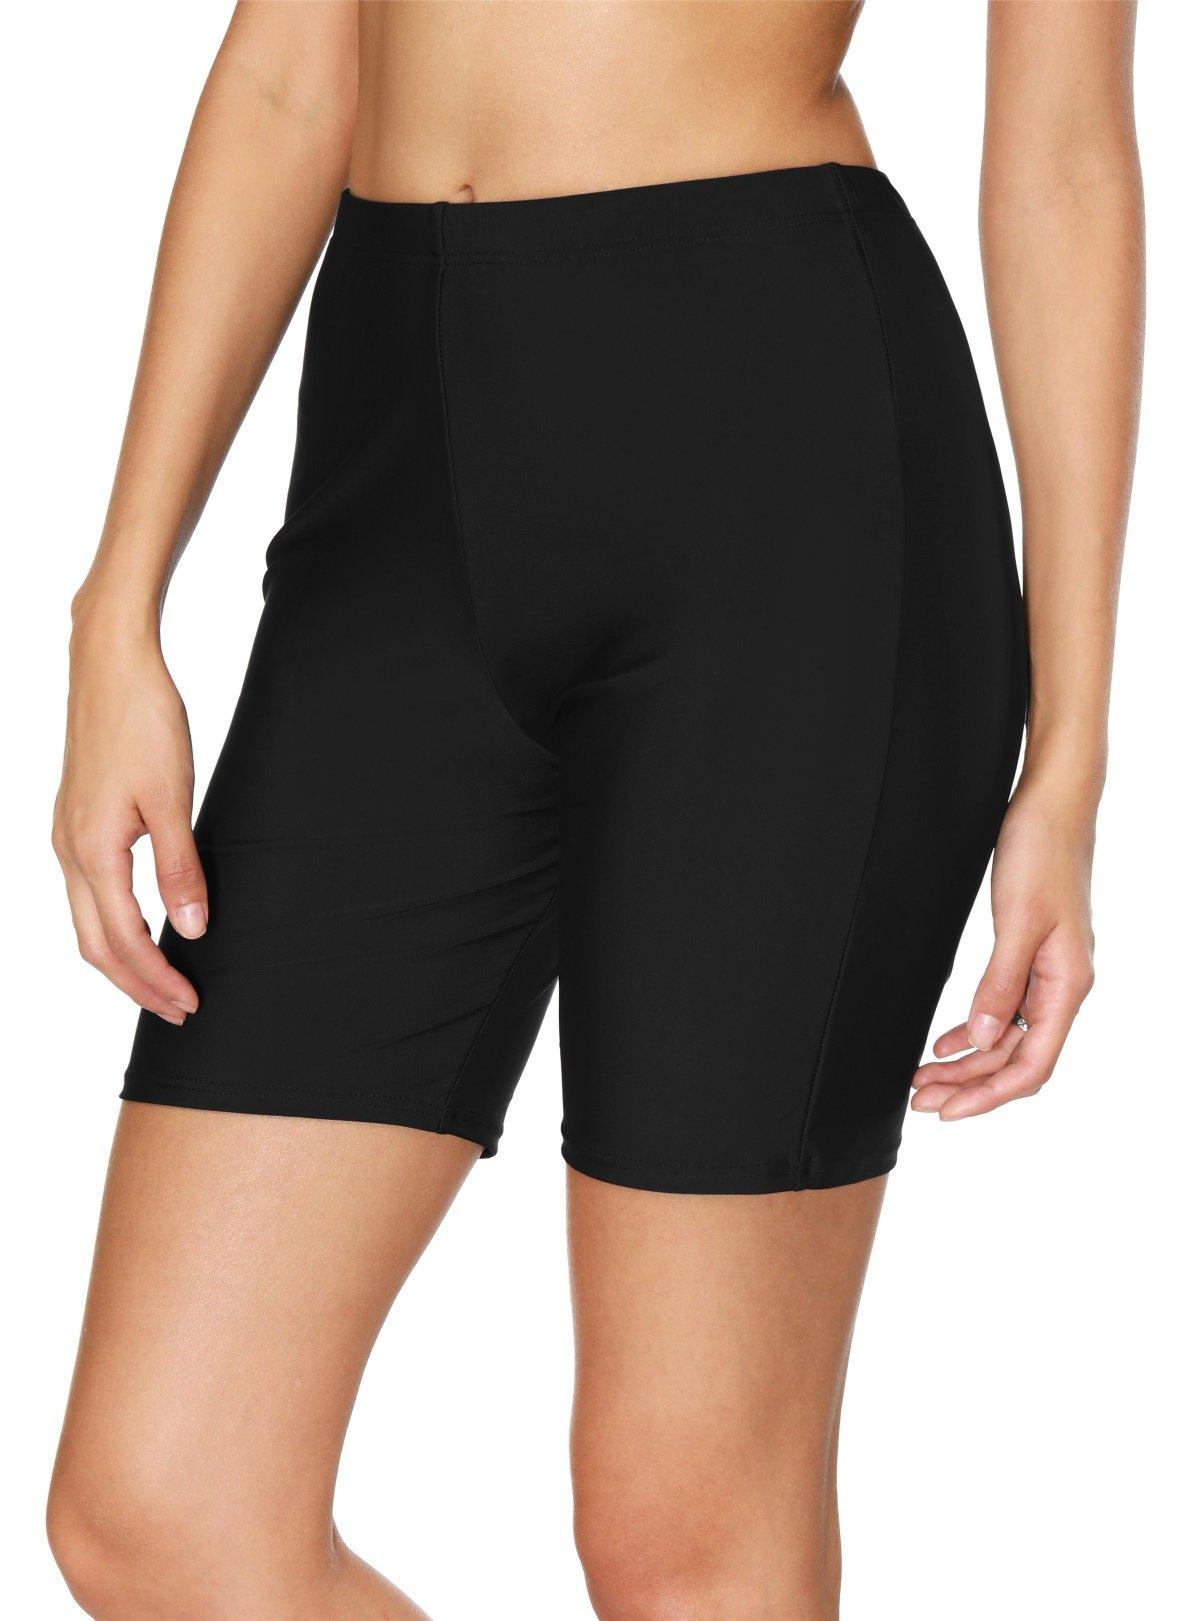 BeautyIn Women's Stretch Board Shorts Solid Beach Shorts Sport Swimsuits Bottom,Black 1,14/Tag 2XL